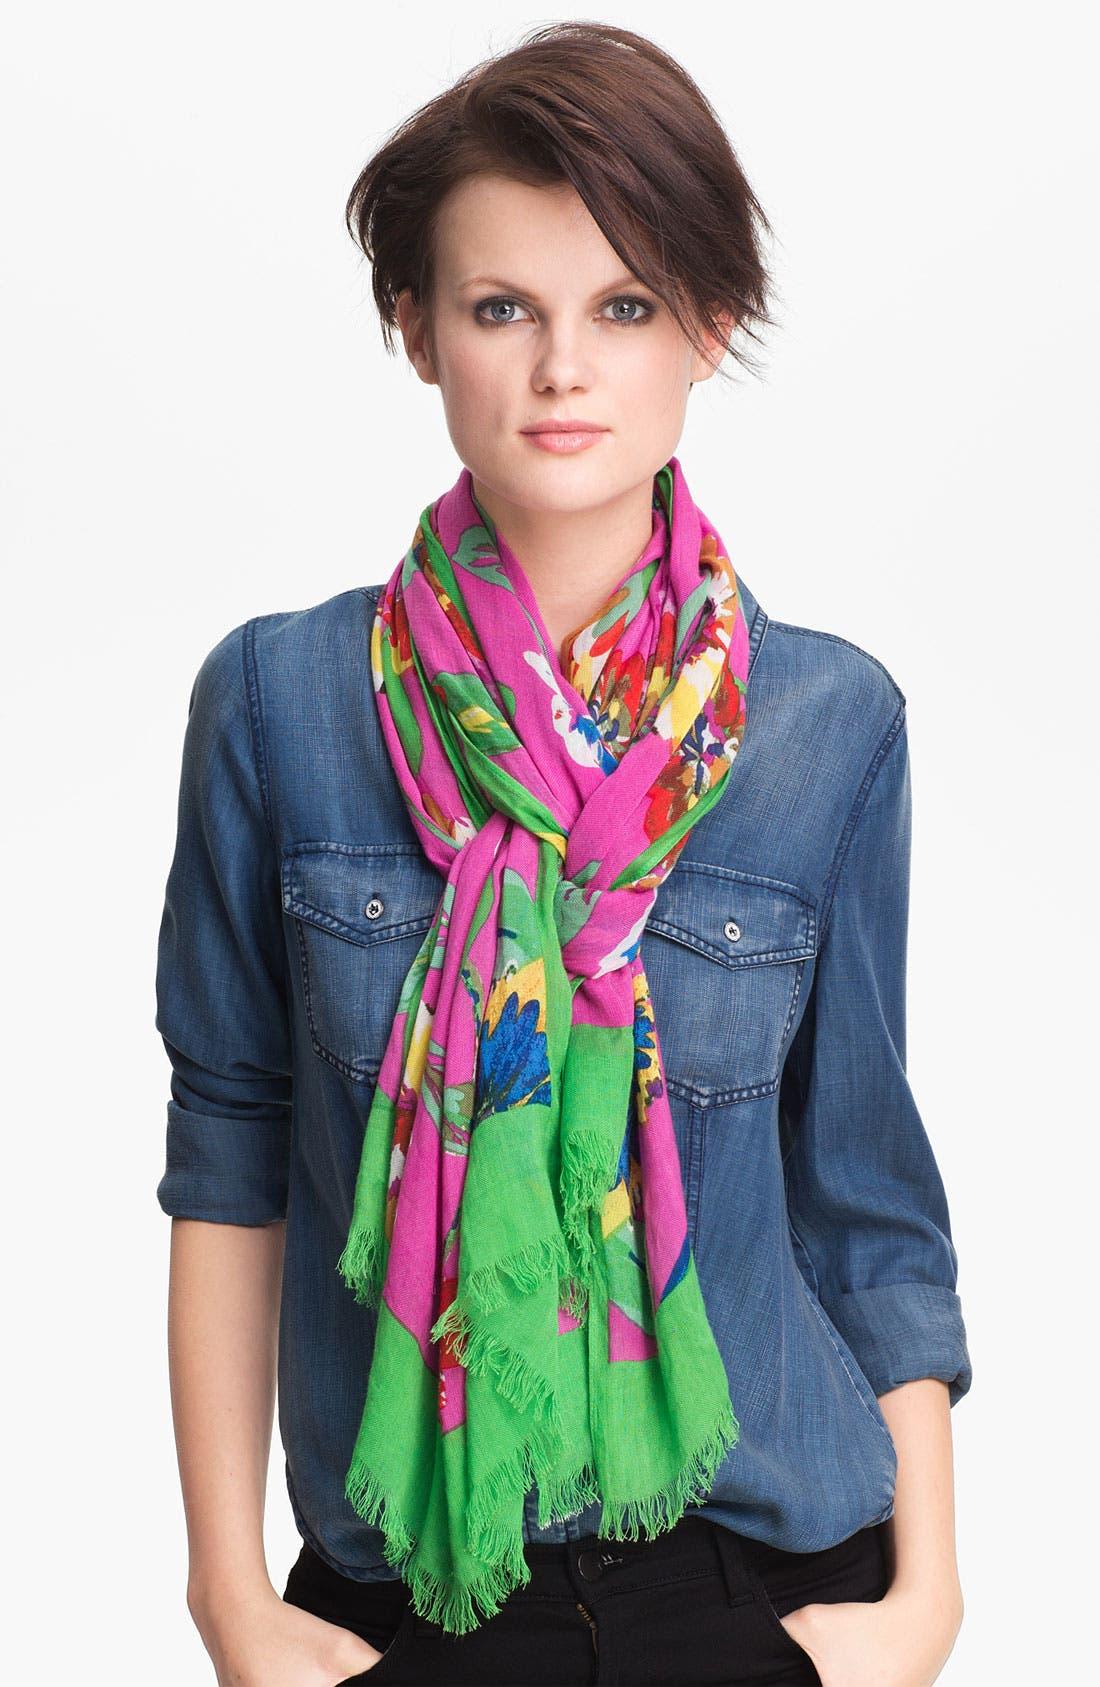 Alternate Image 1 Selected - kate spade new york 'jumbo blossom' scarf